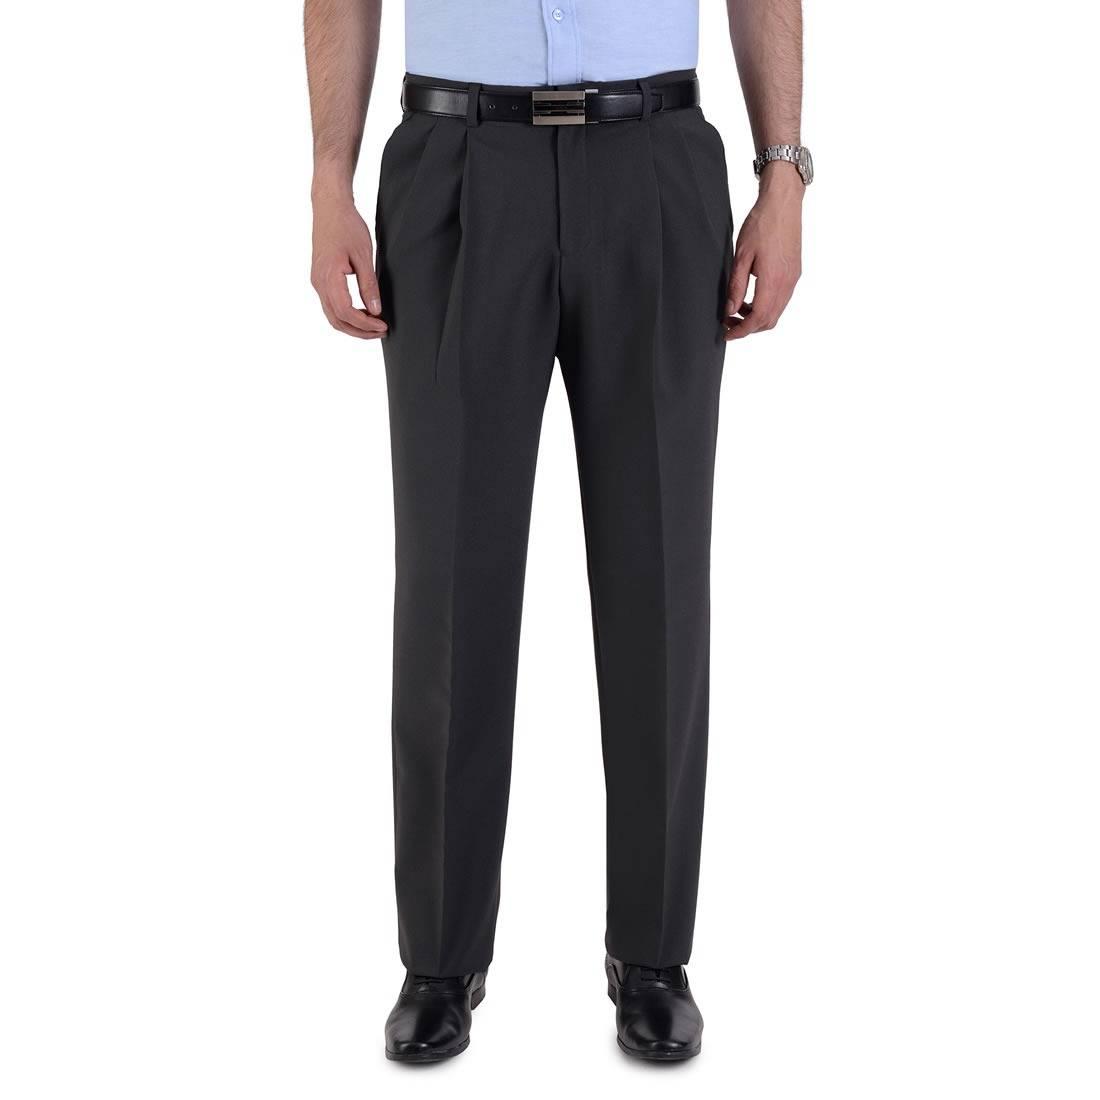 010080126808-01-Pantalon-de-Vestir-Poliester-Con-Pinzas-Fit-Tradicional-Oxford-yale